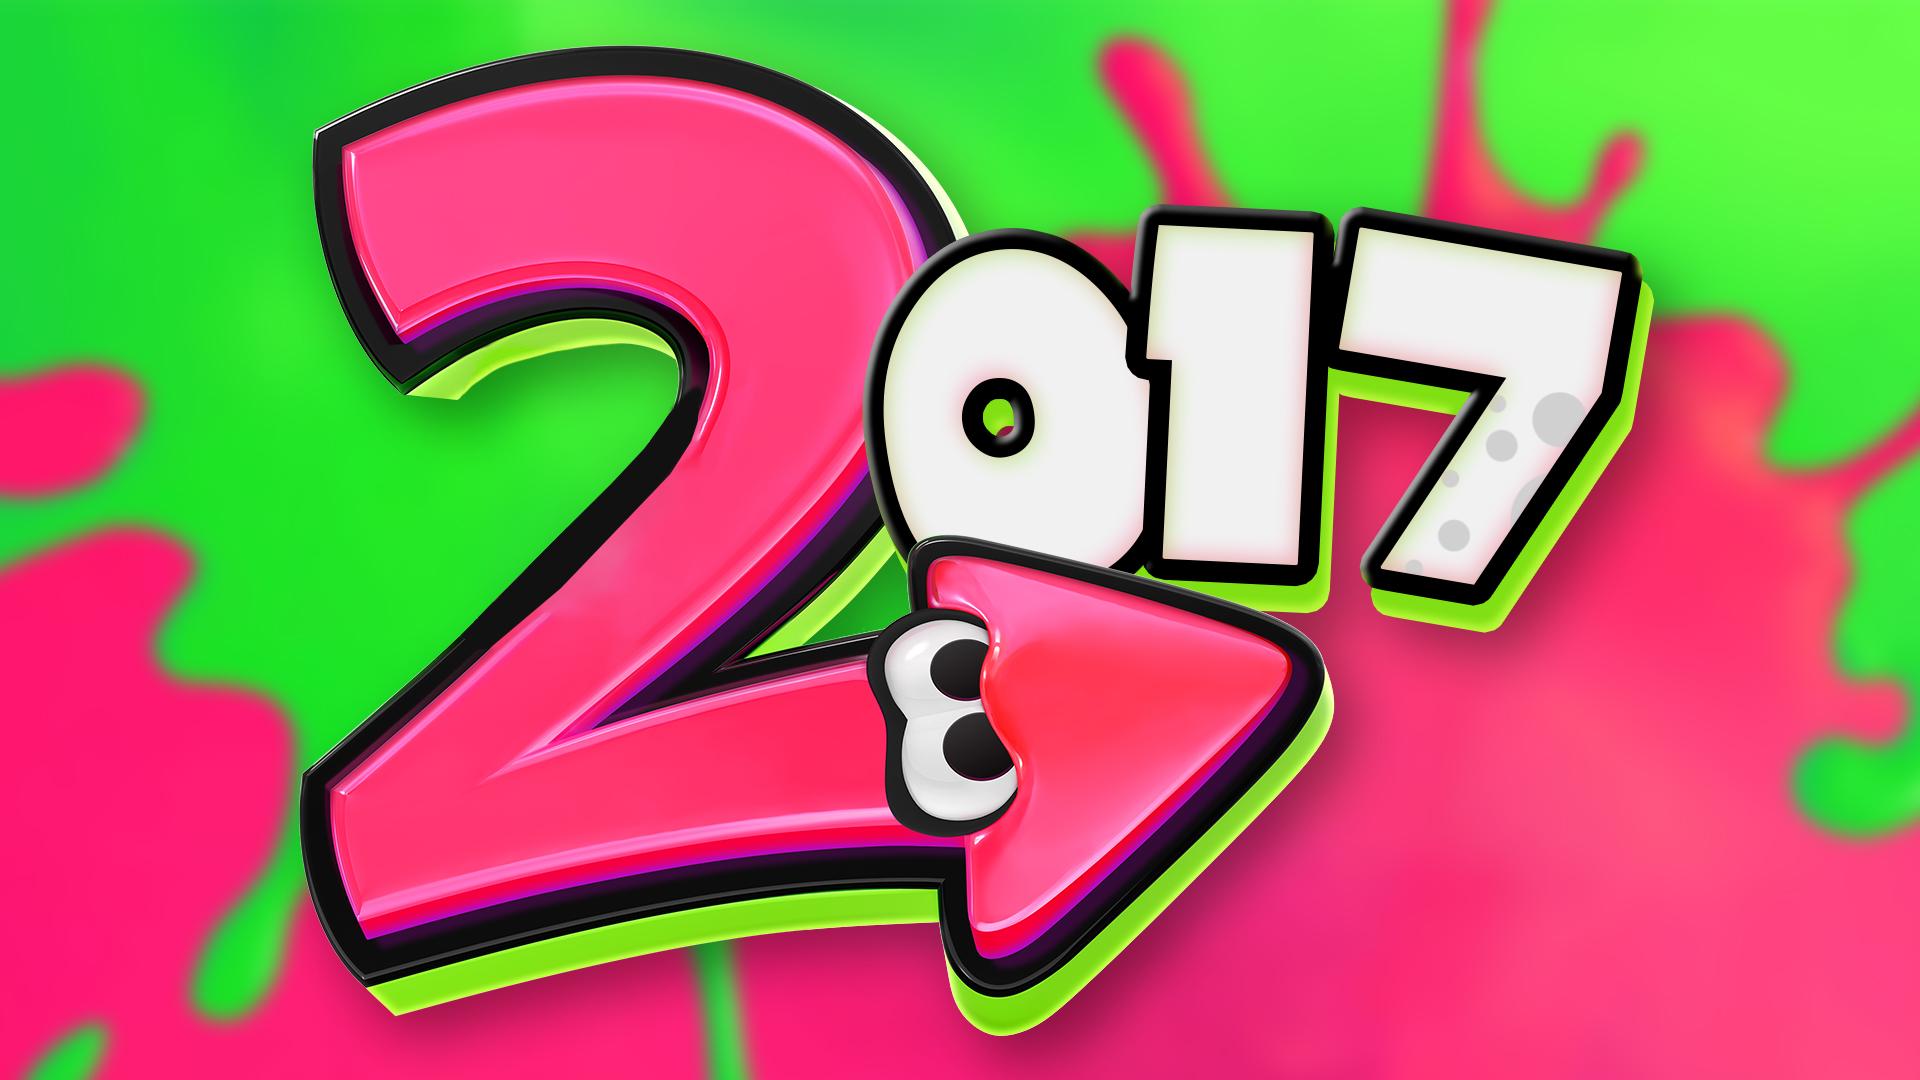 2017 Splatoon 2.jpg